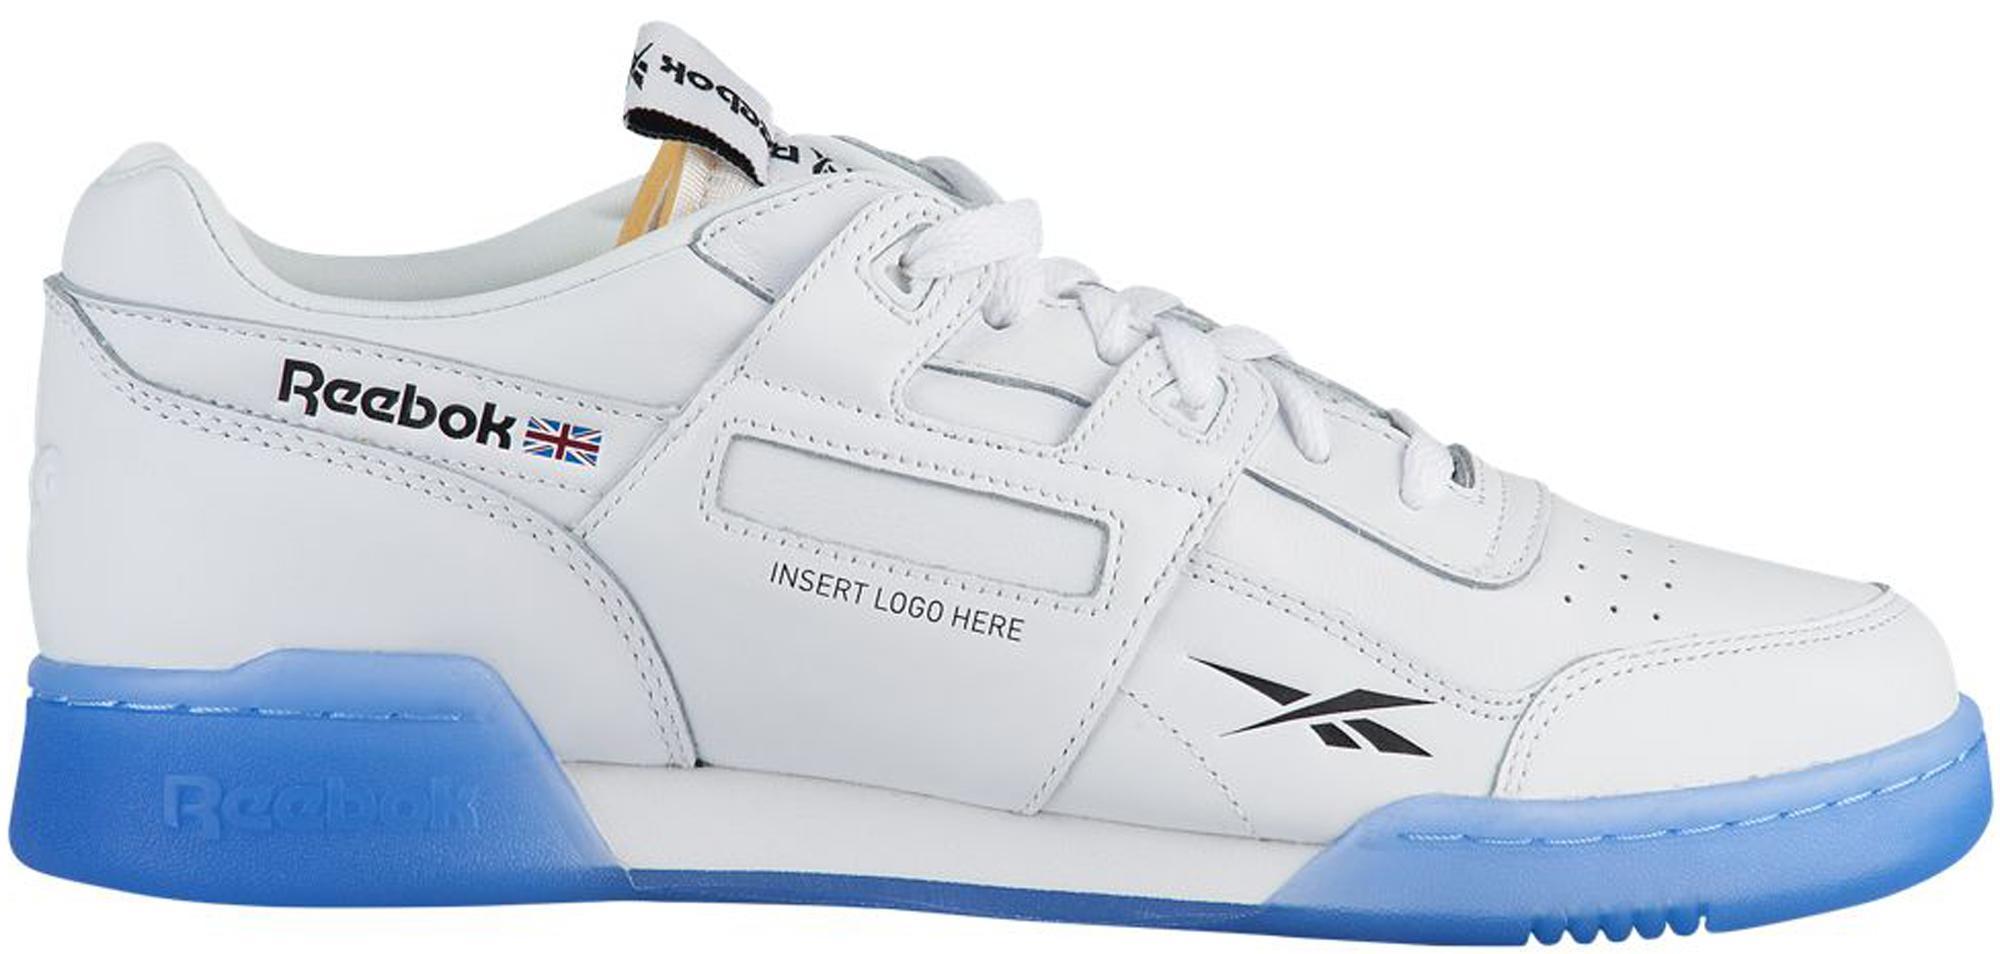 728cec7e4463 Lyst - Reebok Workout Plus 3 am Nola in White for Men